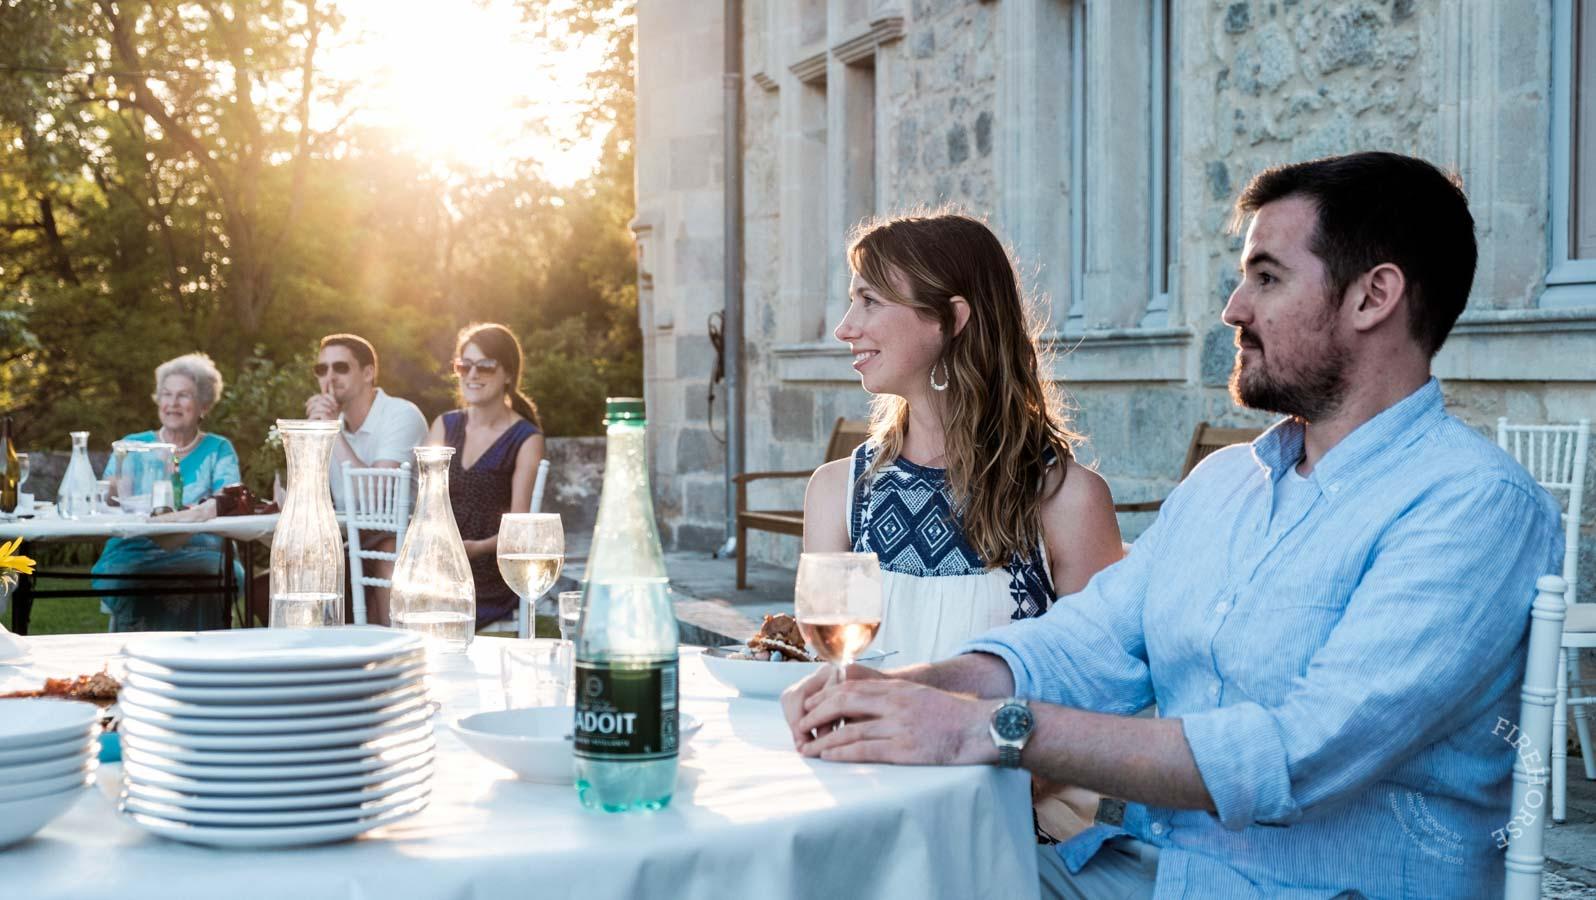 Lot-et-Garonne-Wedding-Photography-074